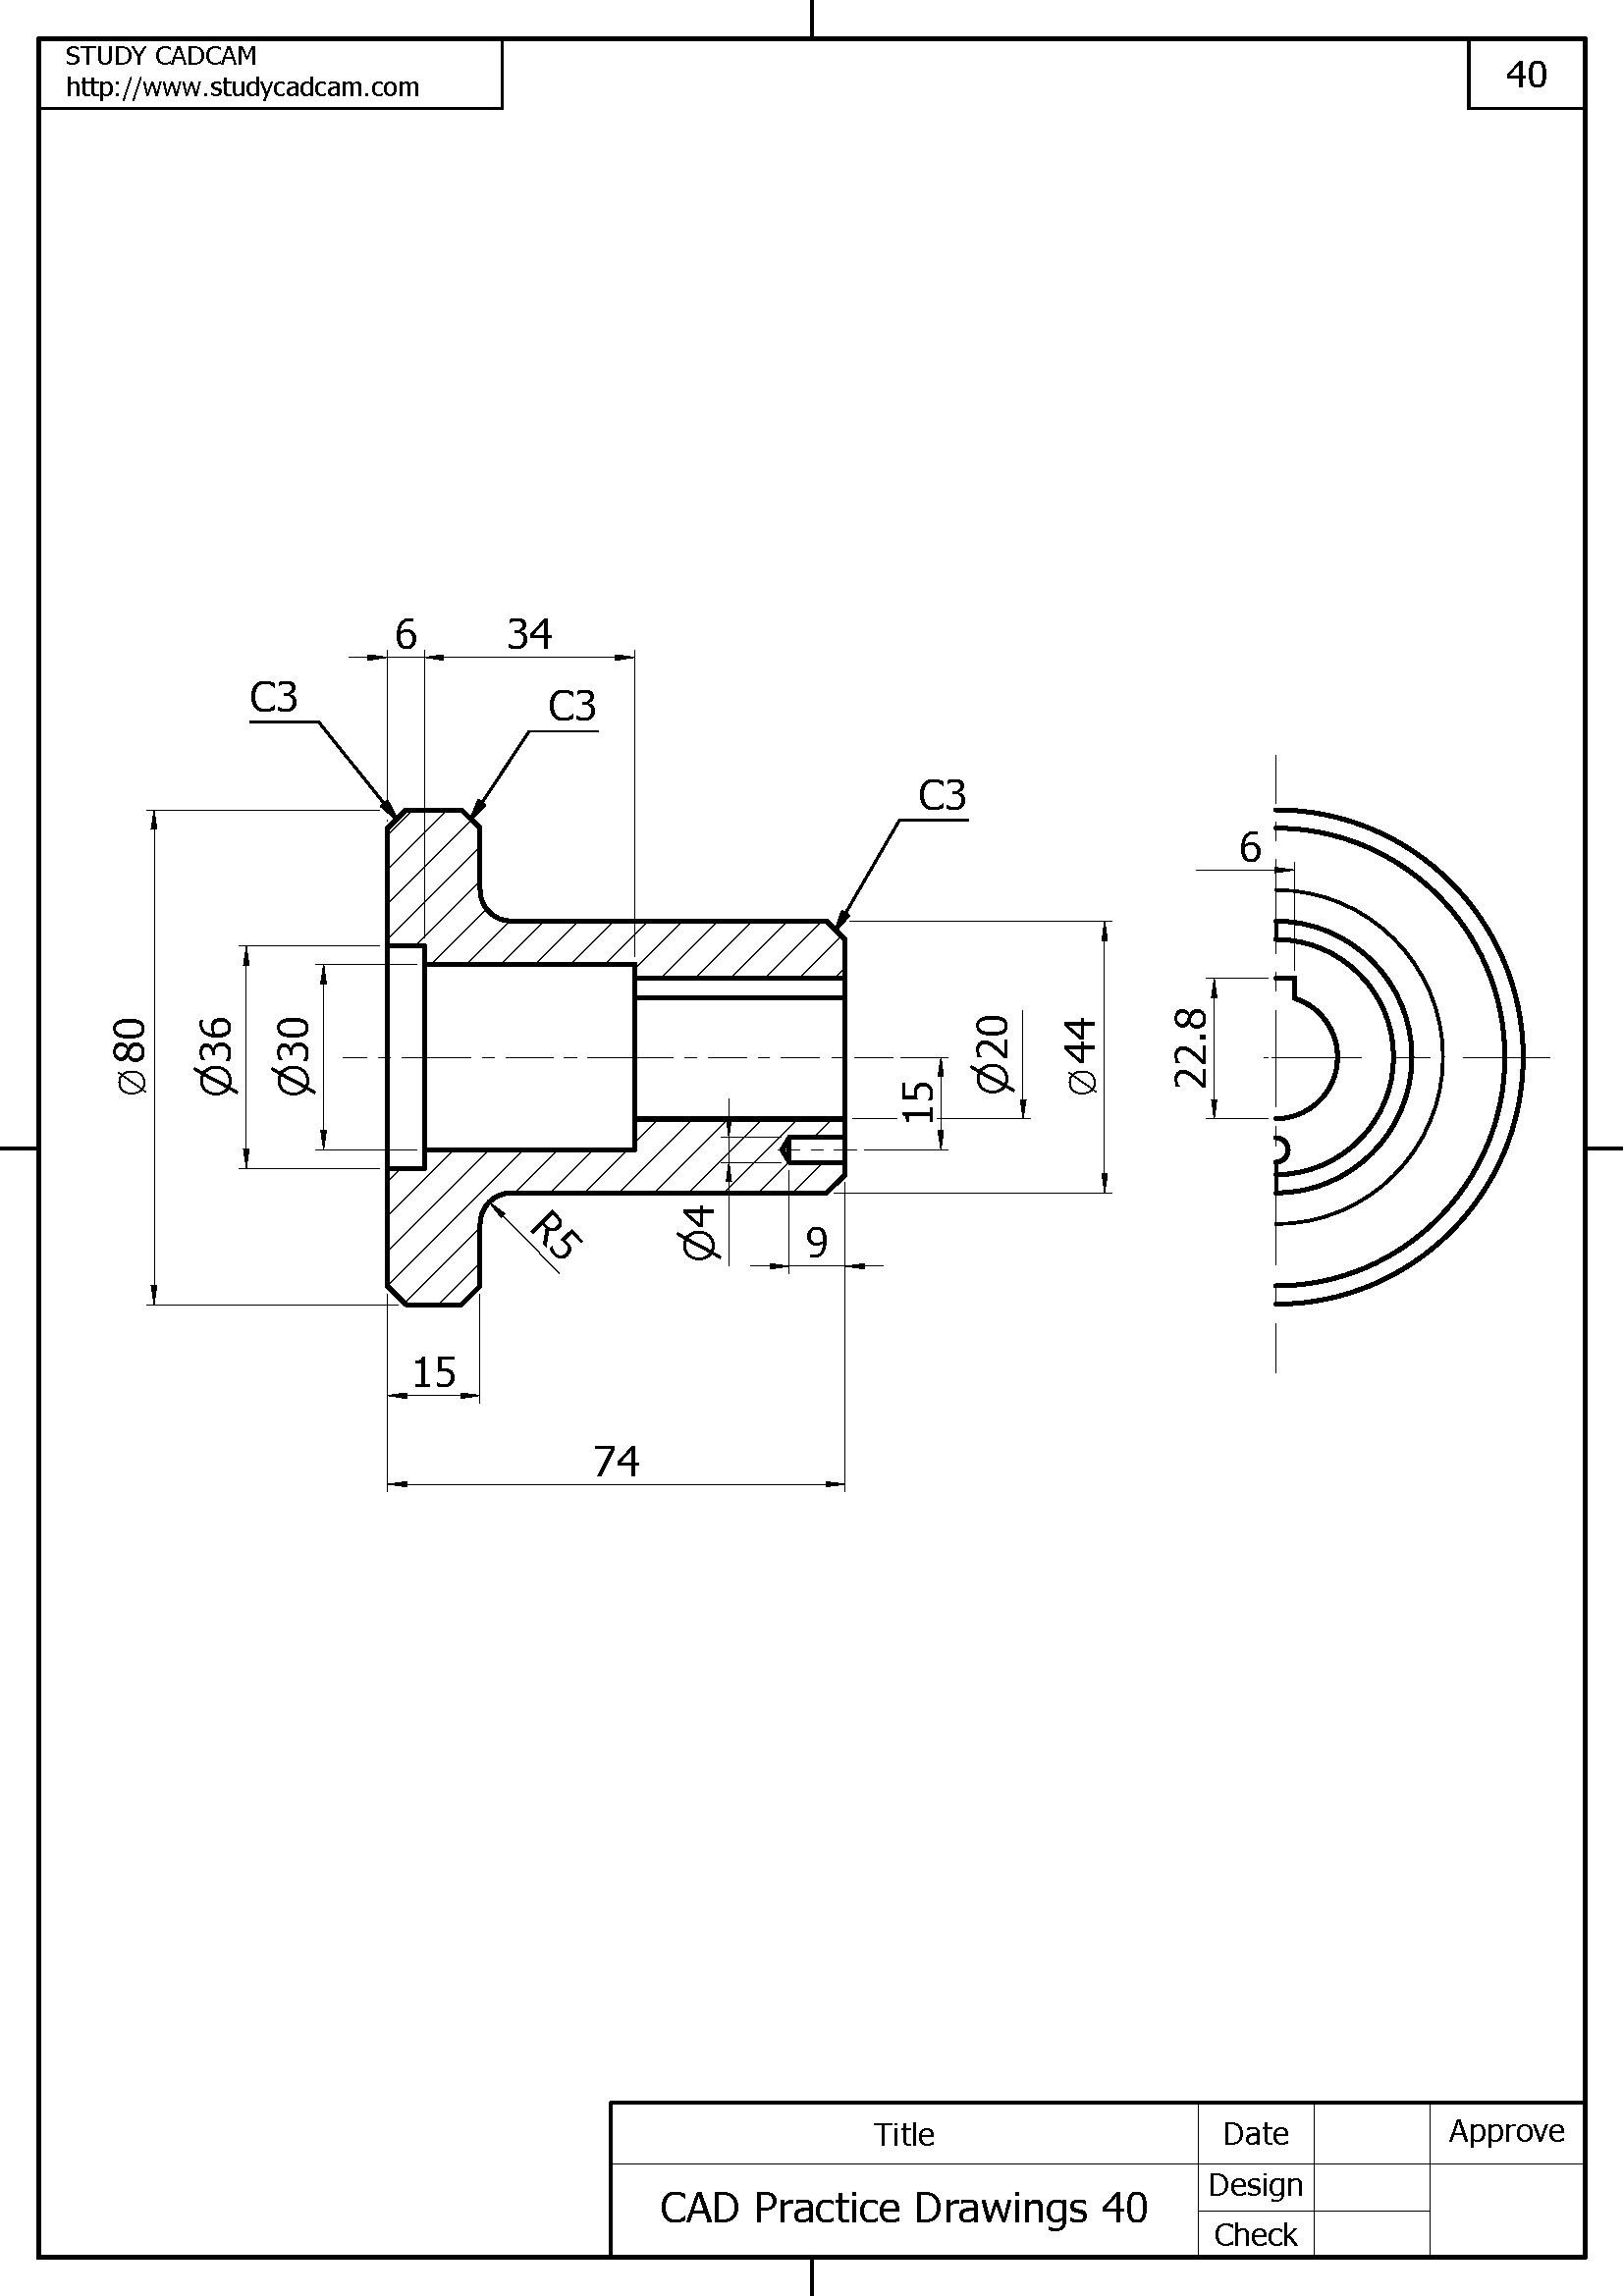 sprinkler wiring diagram Collection-Cad Wiring Diagram Symbols Fresh Mechanical Engineering Diagrams Hvac Wiring Diagram Sample 7-q